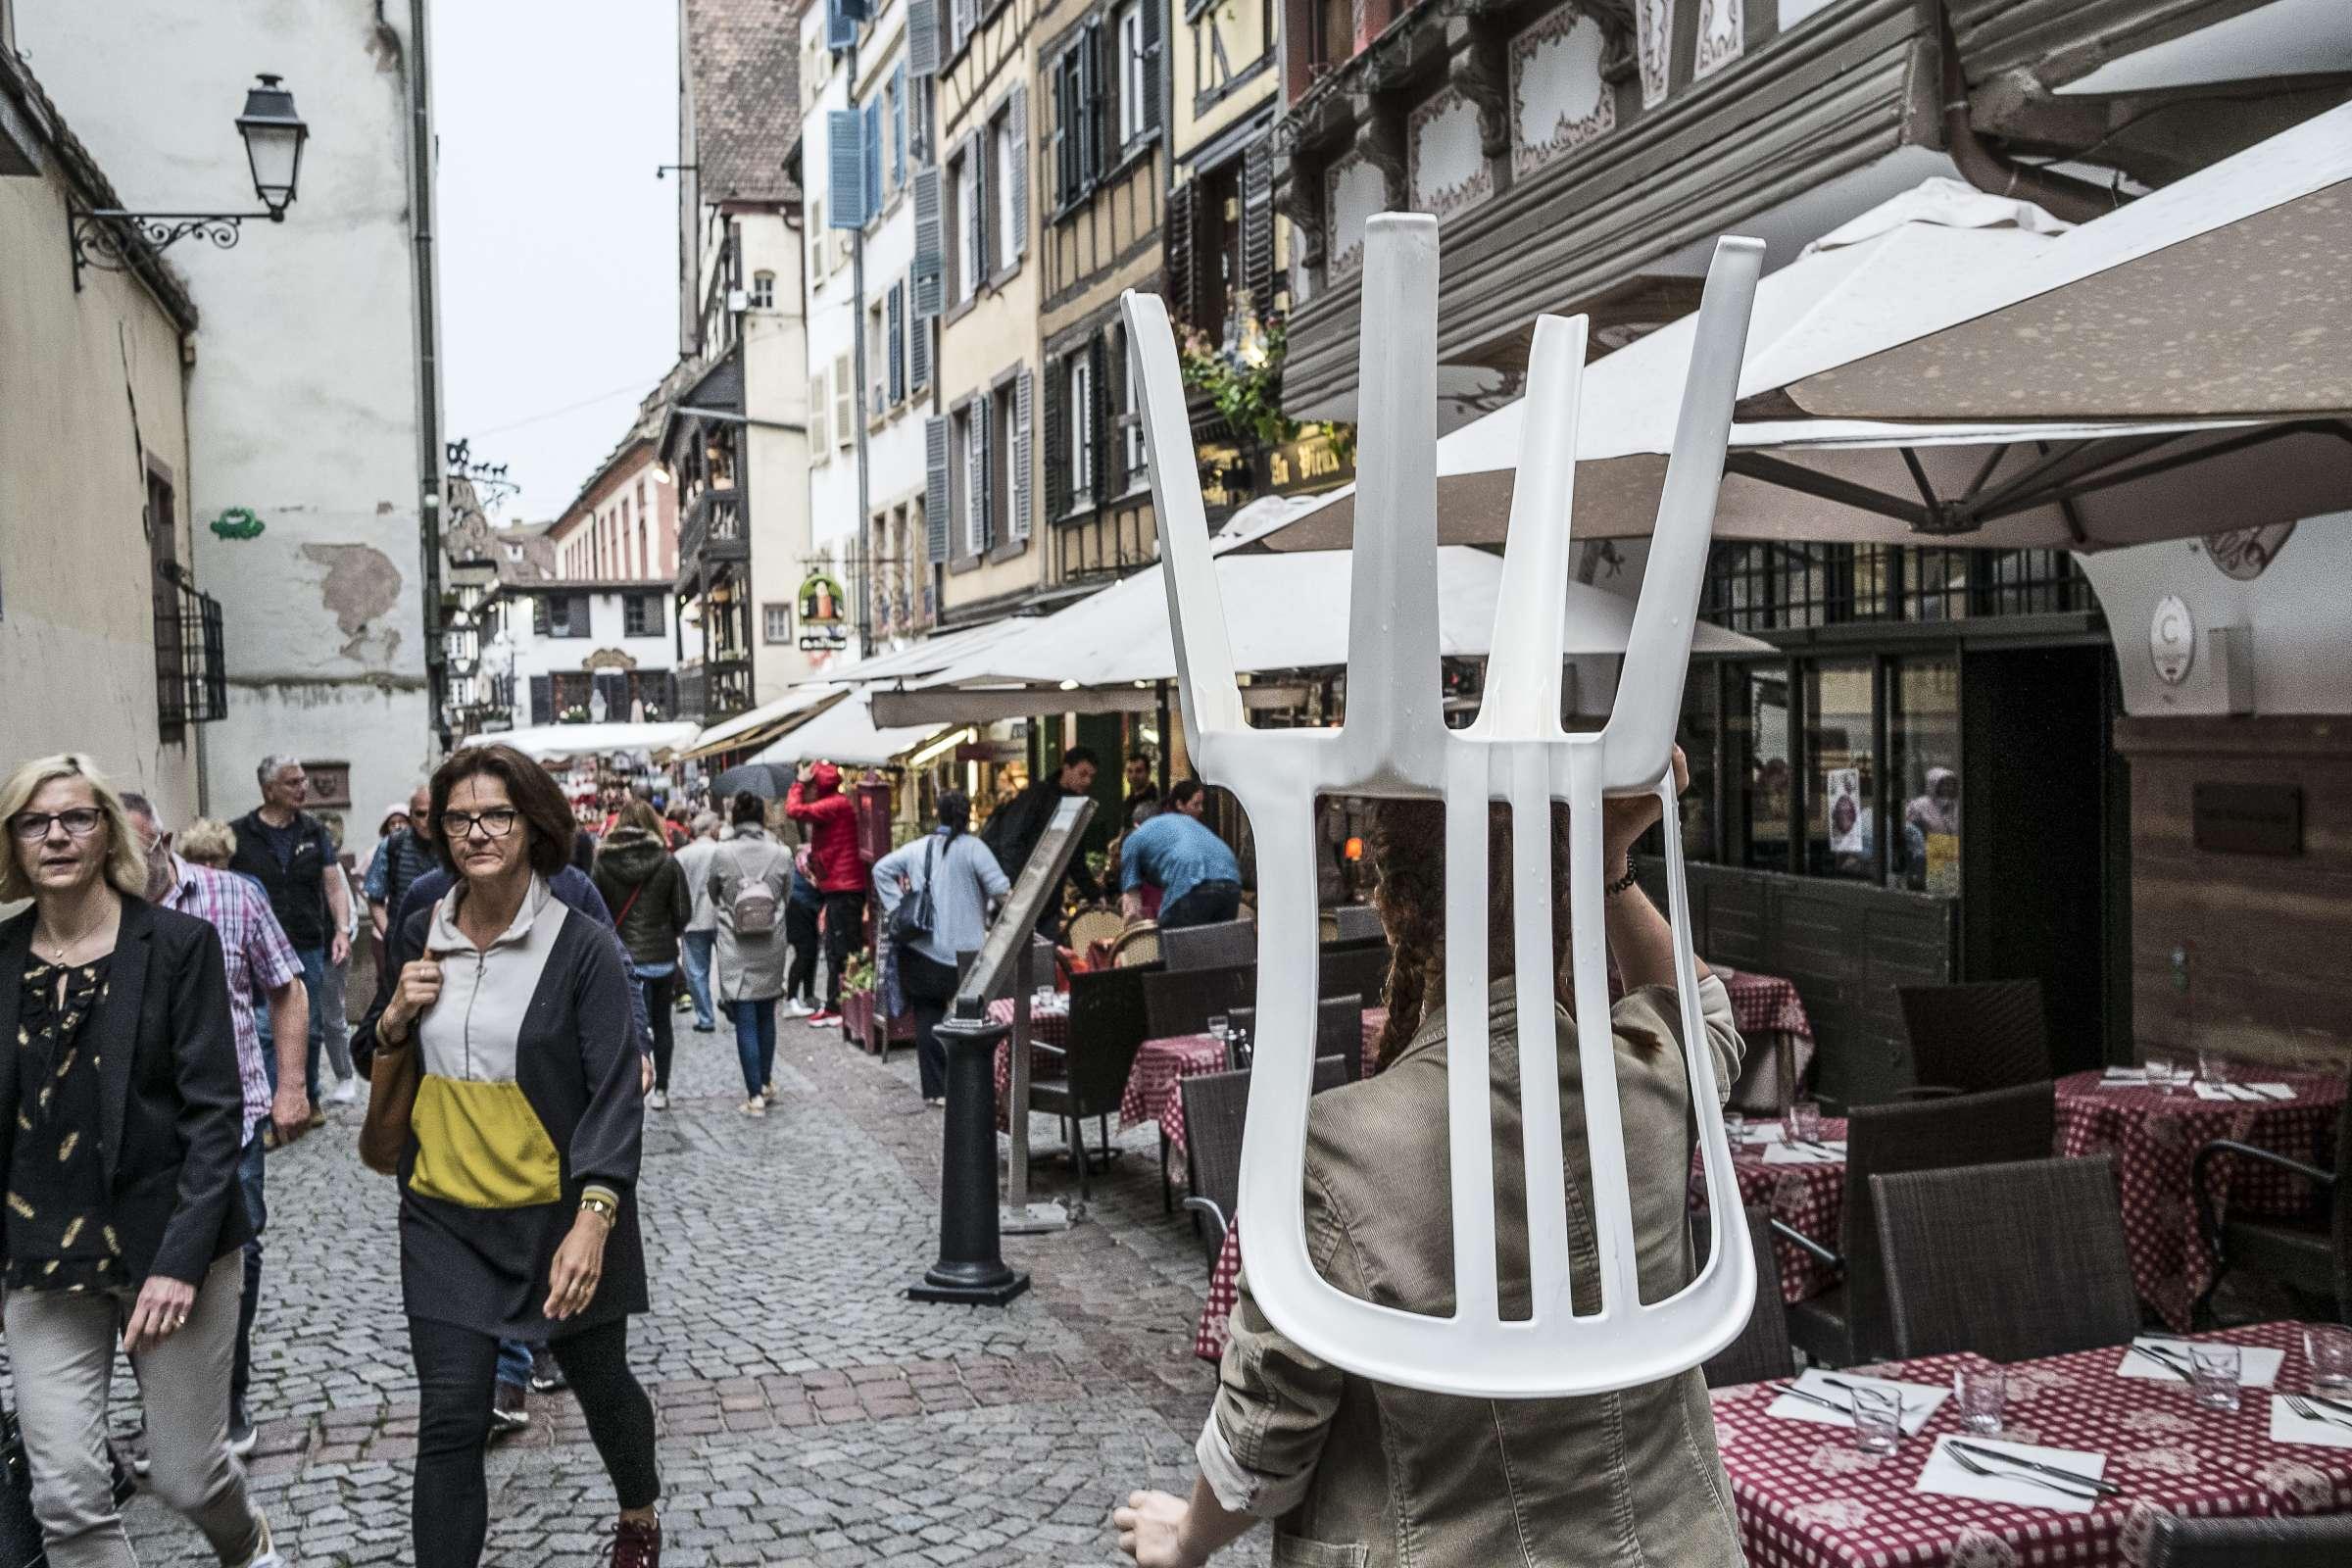 Walking with Chairs, Ienke Kastelein, INACT 2019. Photo : Patrick Lambin